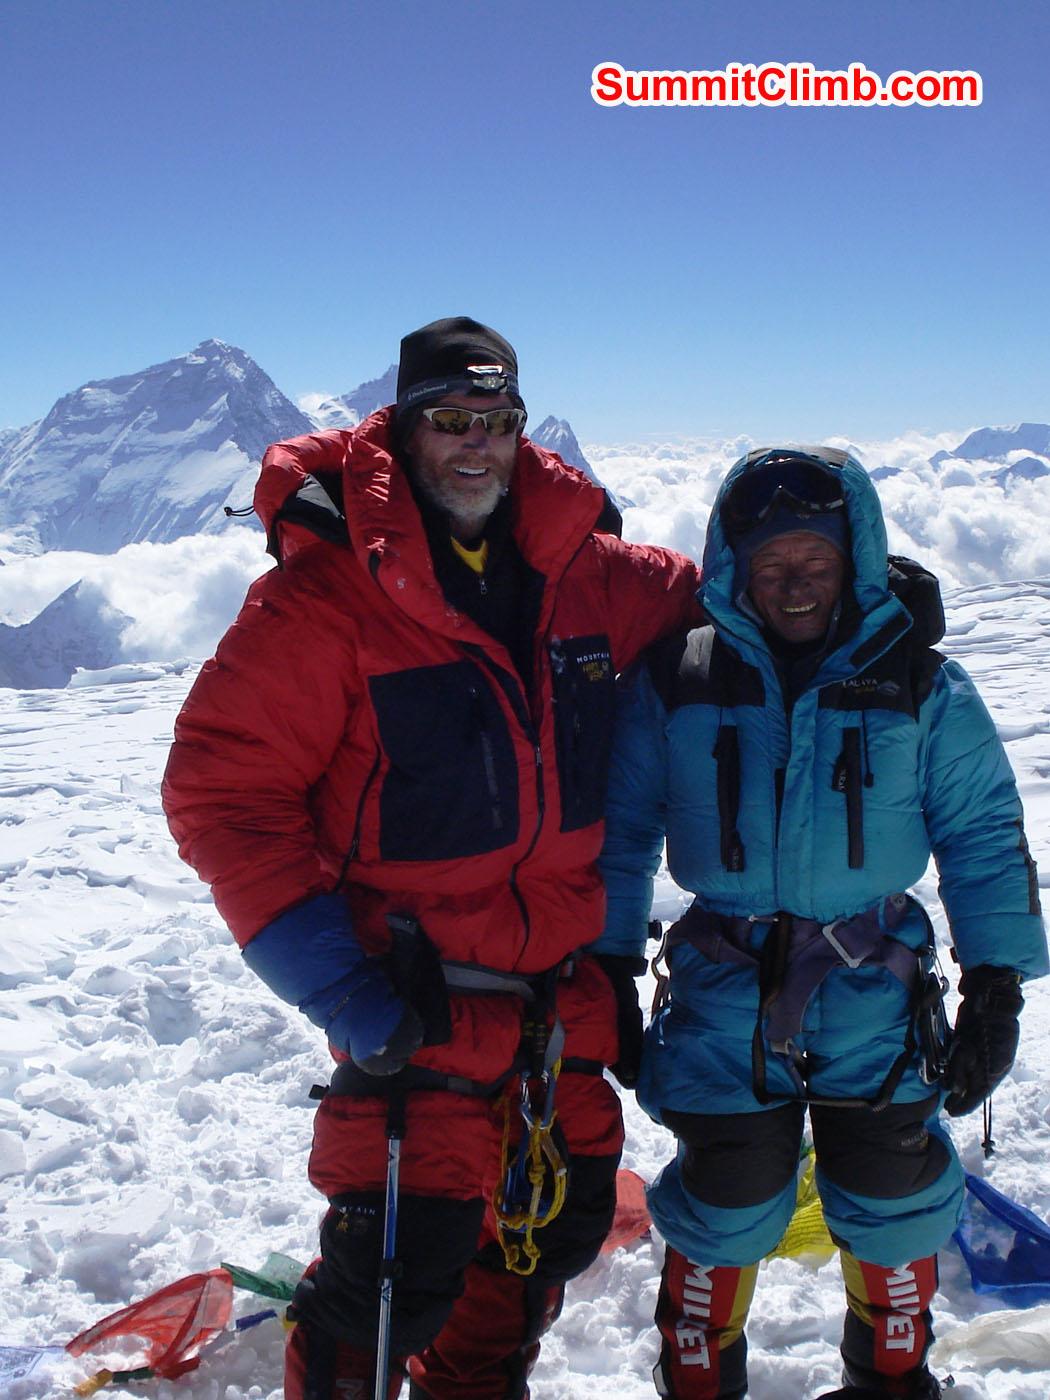 Glenn and Jangbu on the Summit of Cho Oyu. With Everest View. Alan Barclay Photo